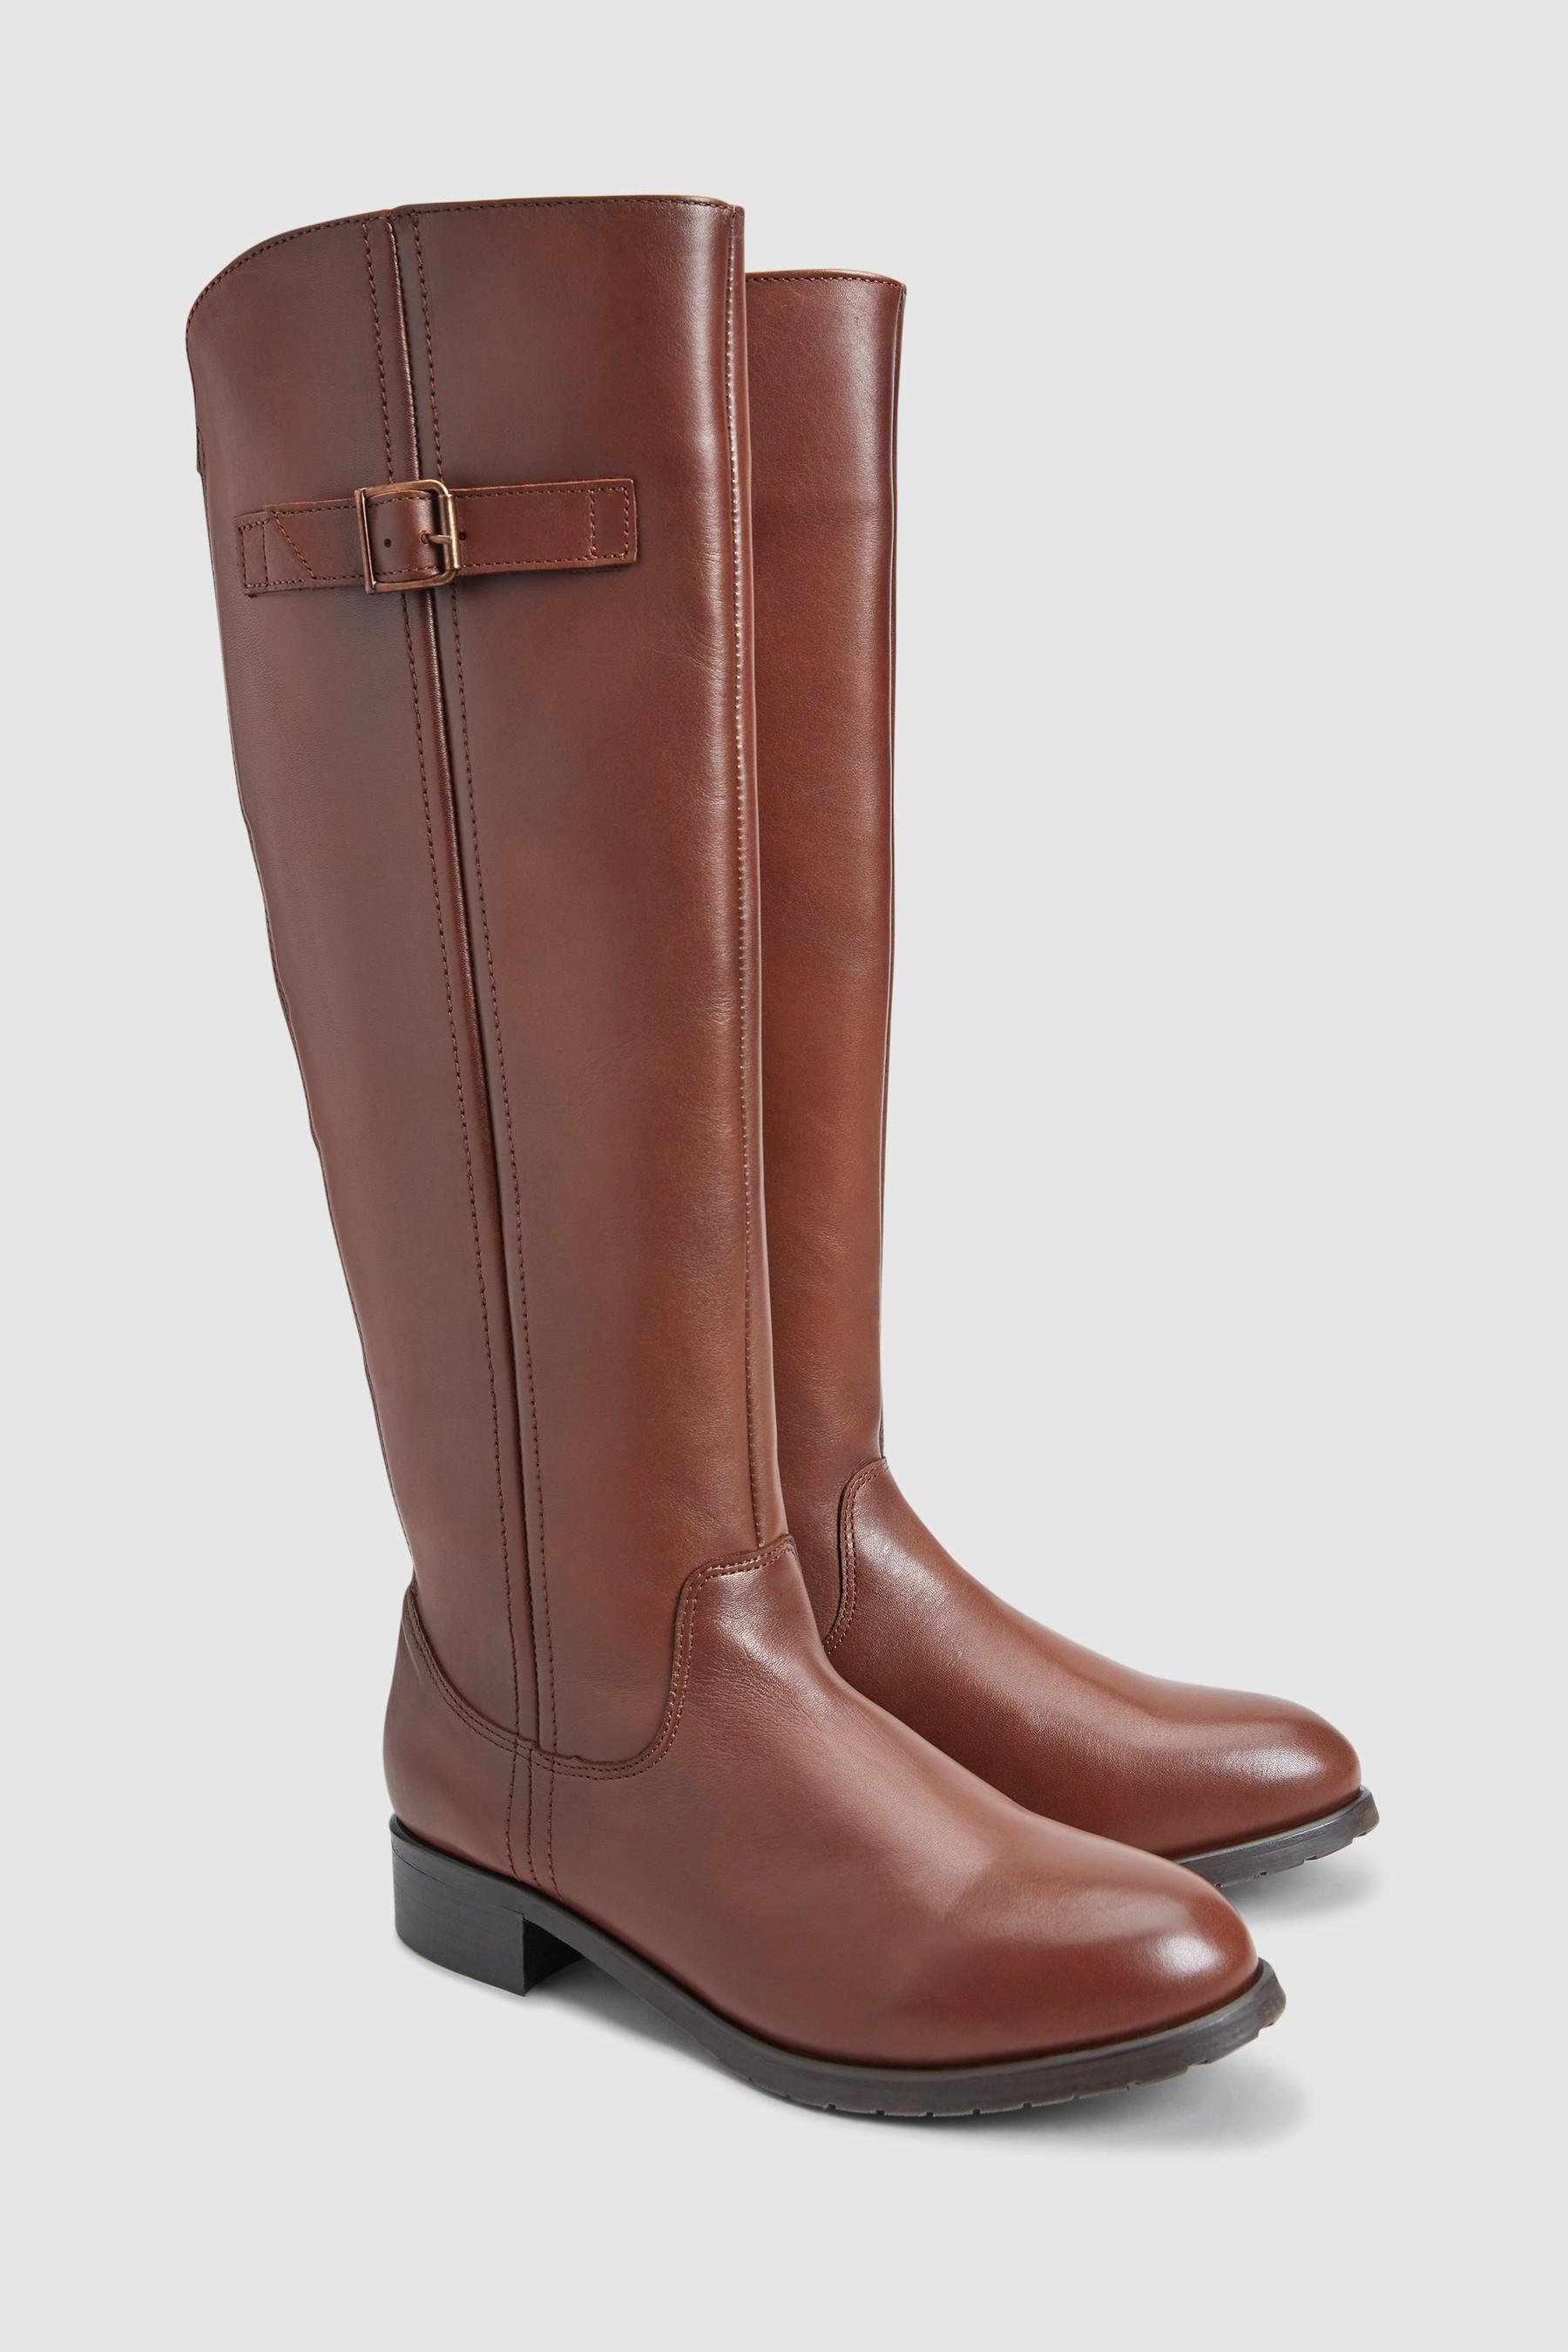 185b067e86d Womens Next Dark Tan Forever Comfort Classic Rider Boots - Brown ...